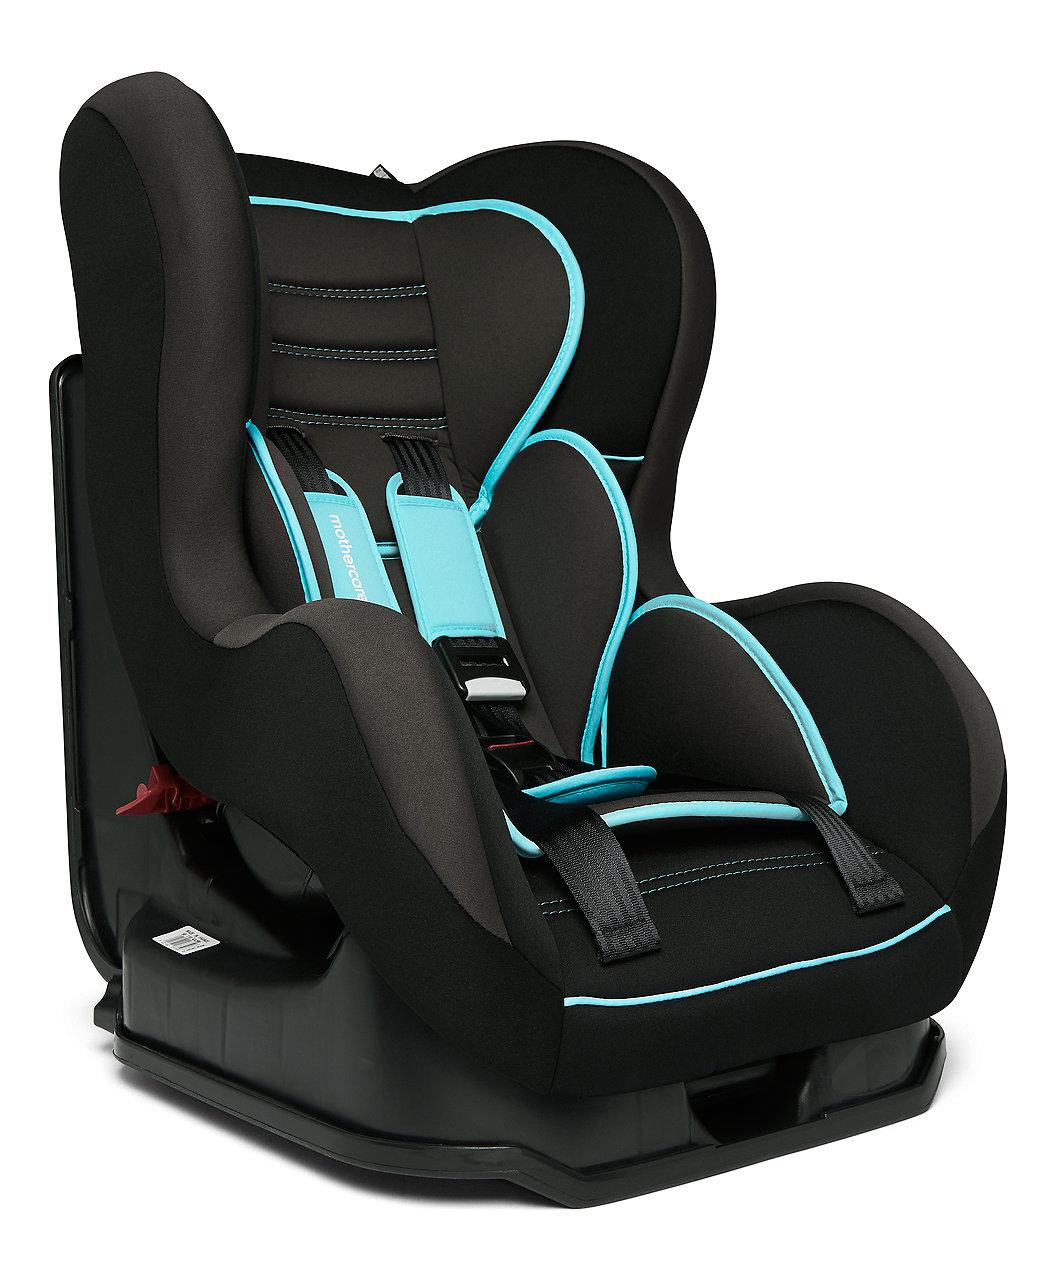 Free Child Car Seats